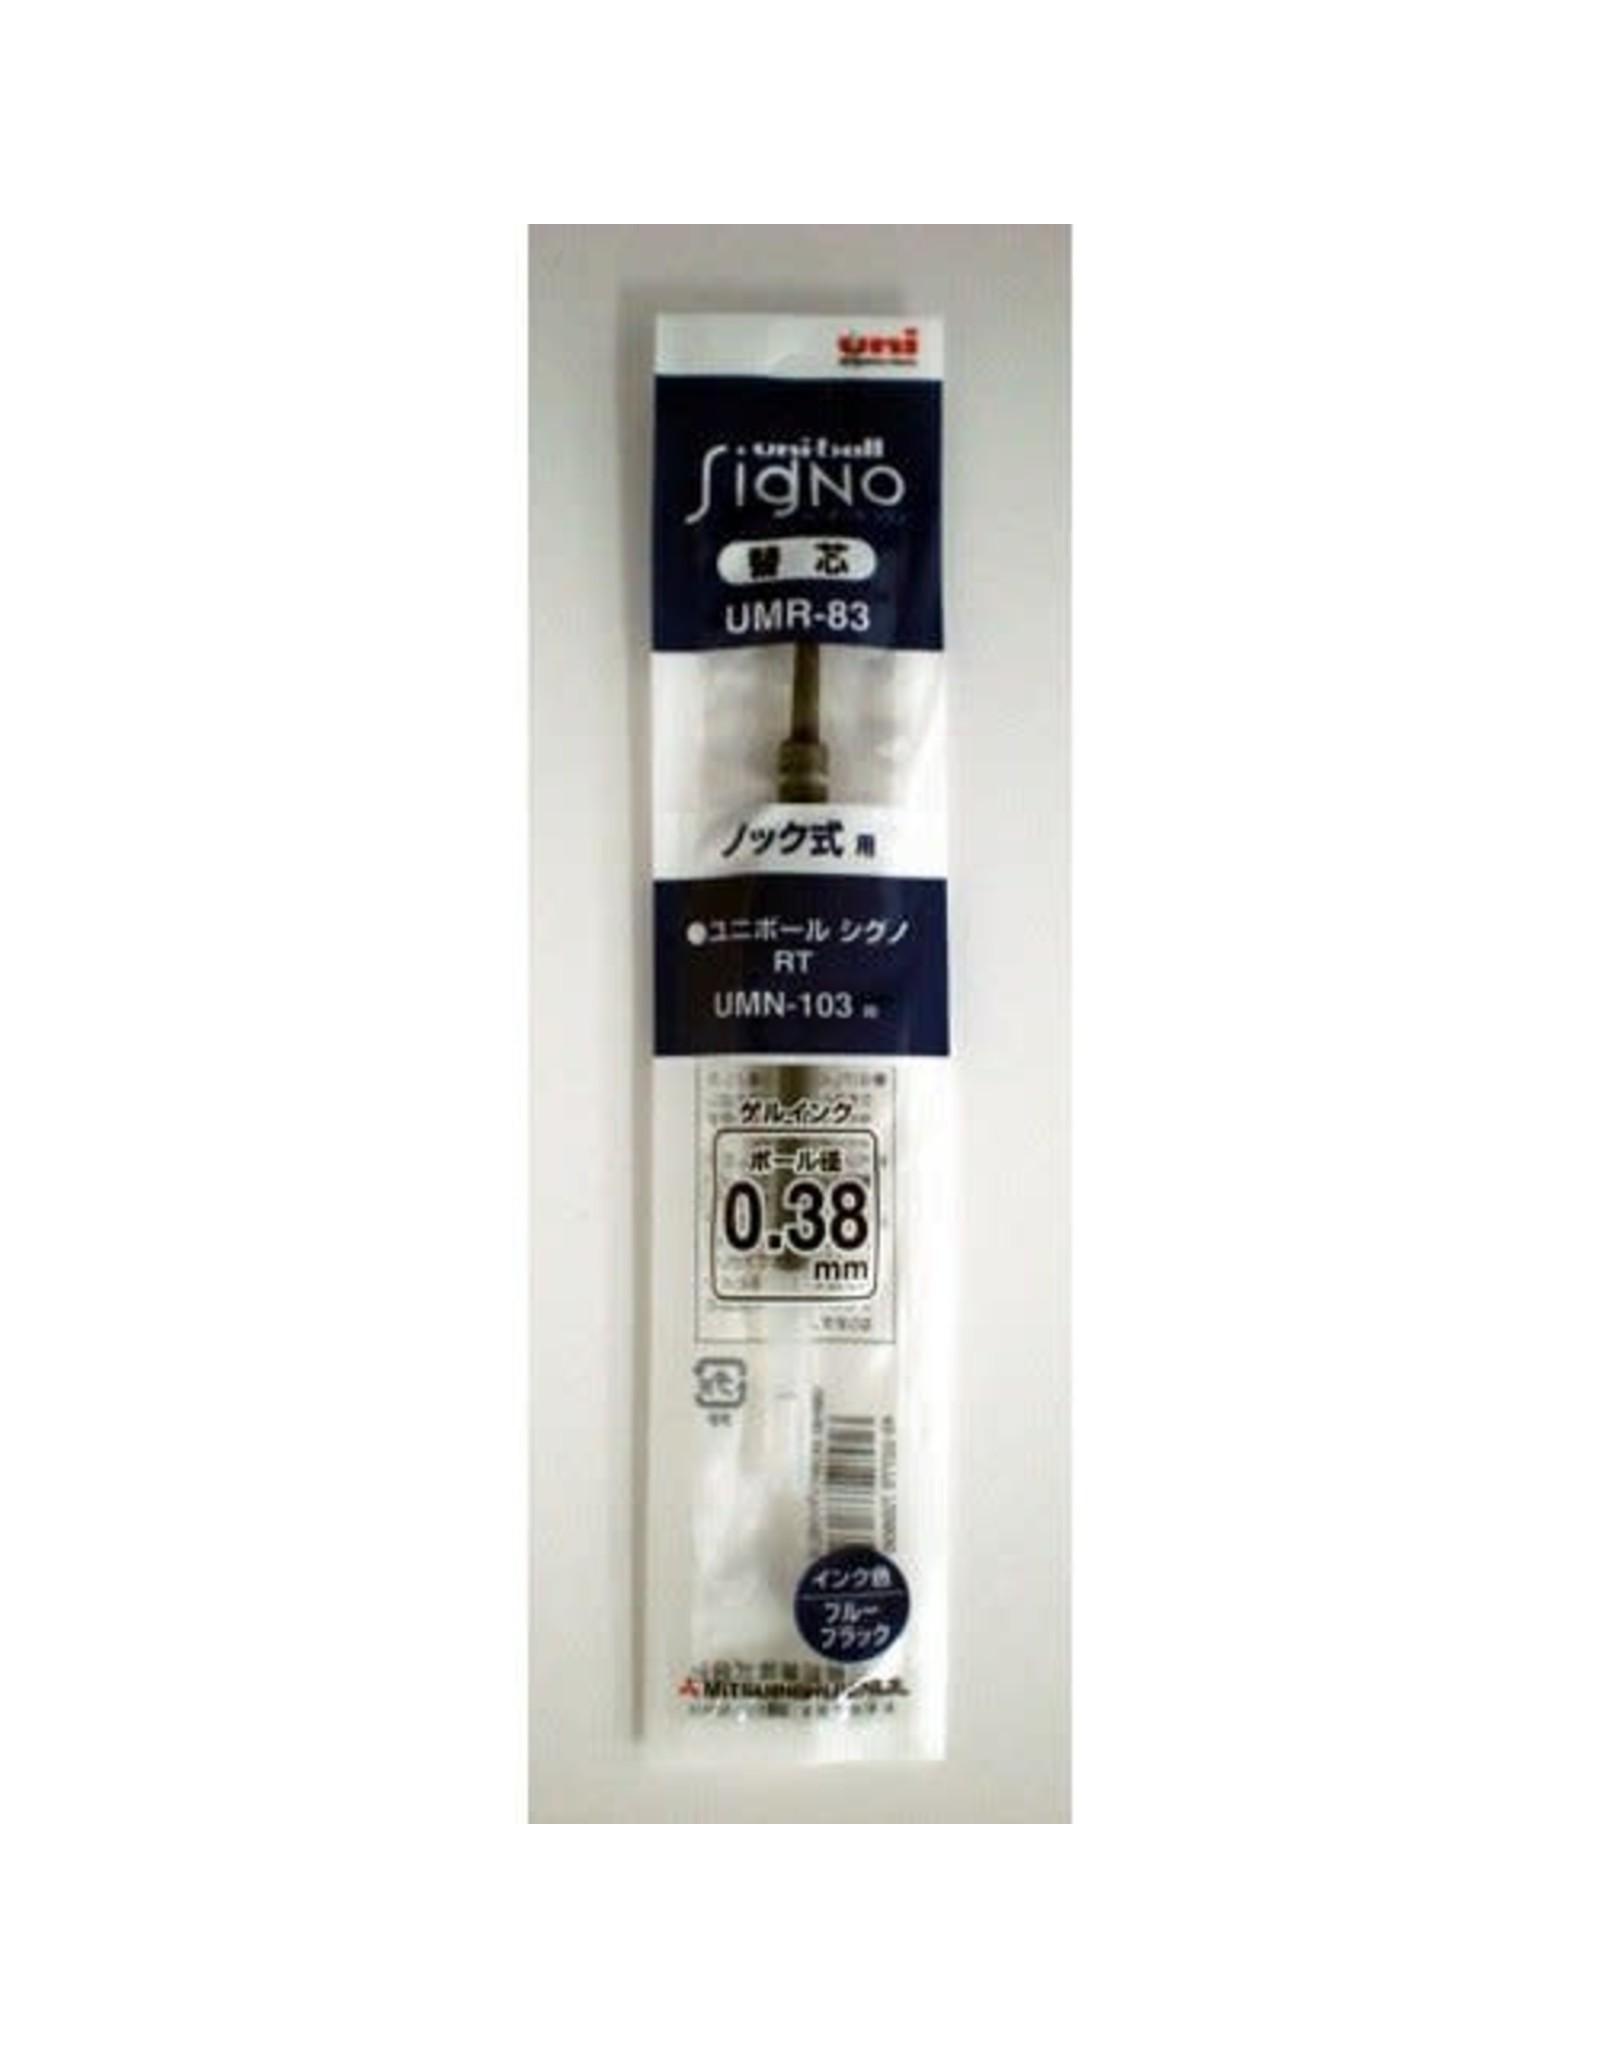 Mitsubishi Pencil Co., Ltd. UNI-BALL SIGNO REFILL BLUE BLACK 0.38 MM UMR-83